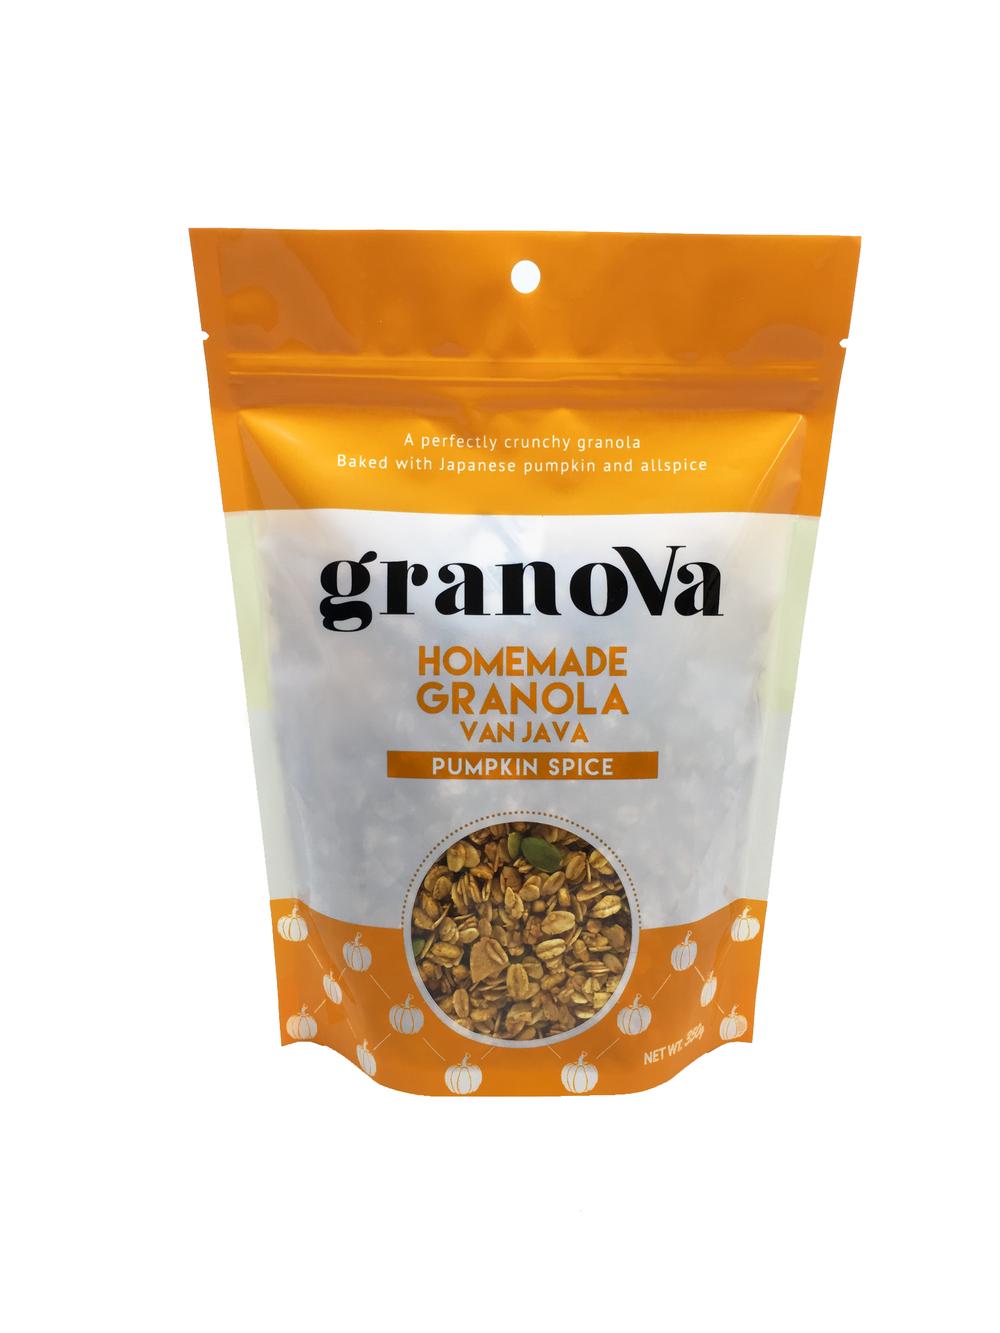 Granova Pumpkin Spice.png